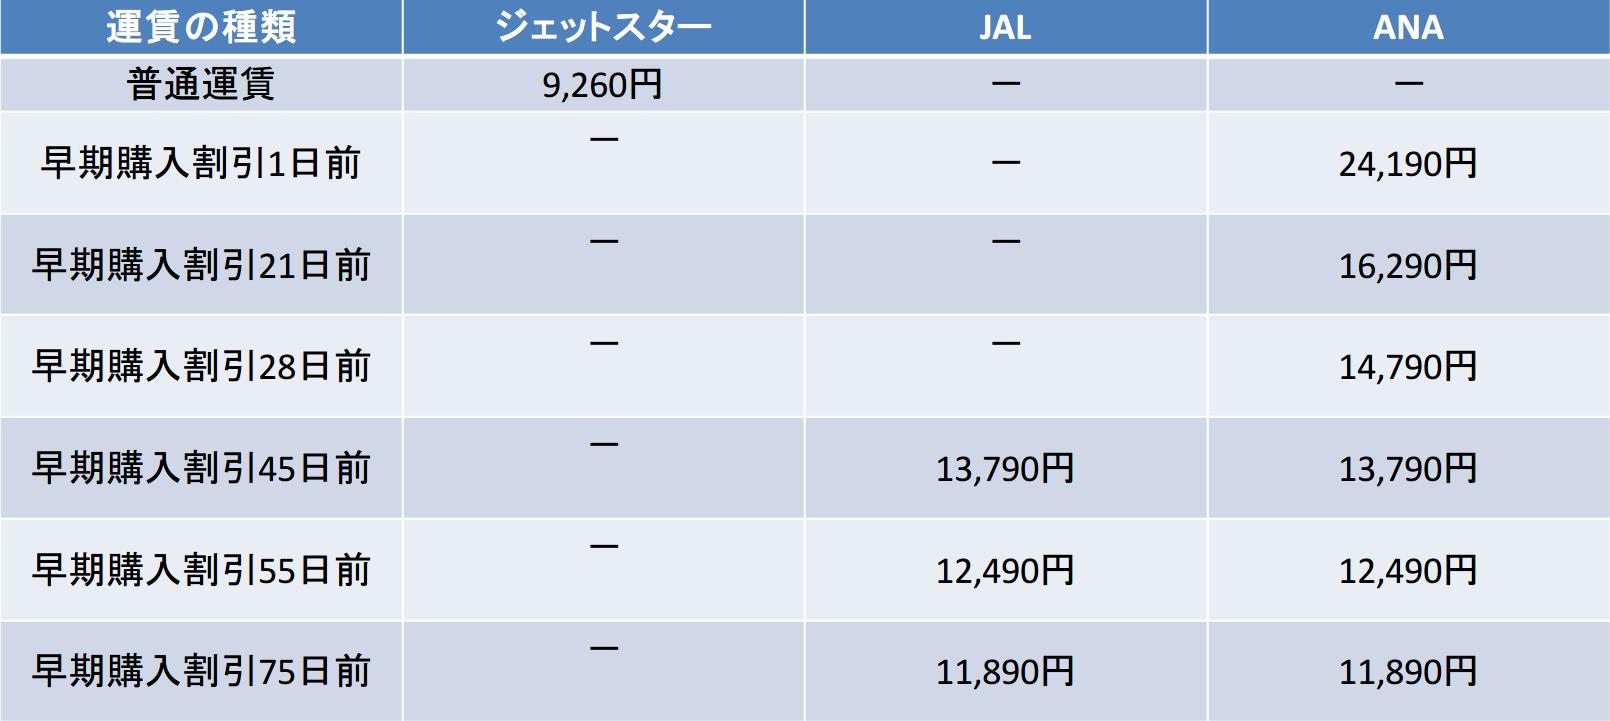 JAL ANA 早期購入割引 比較